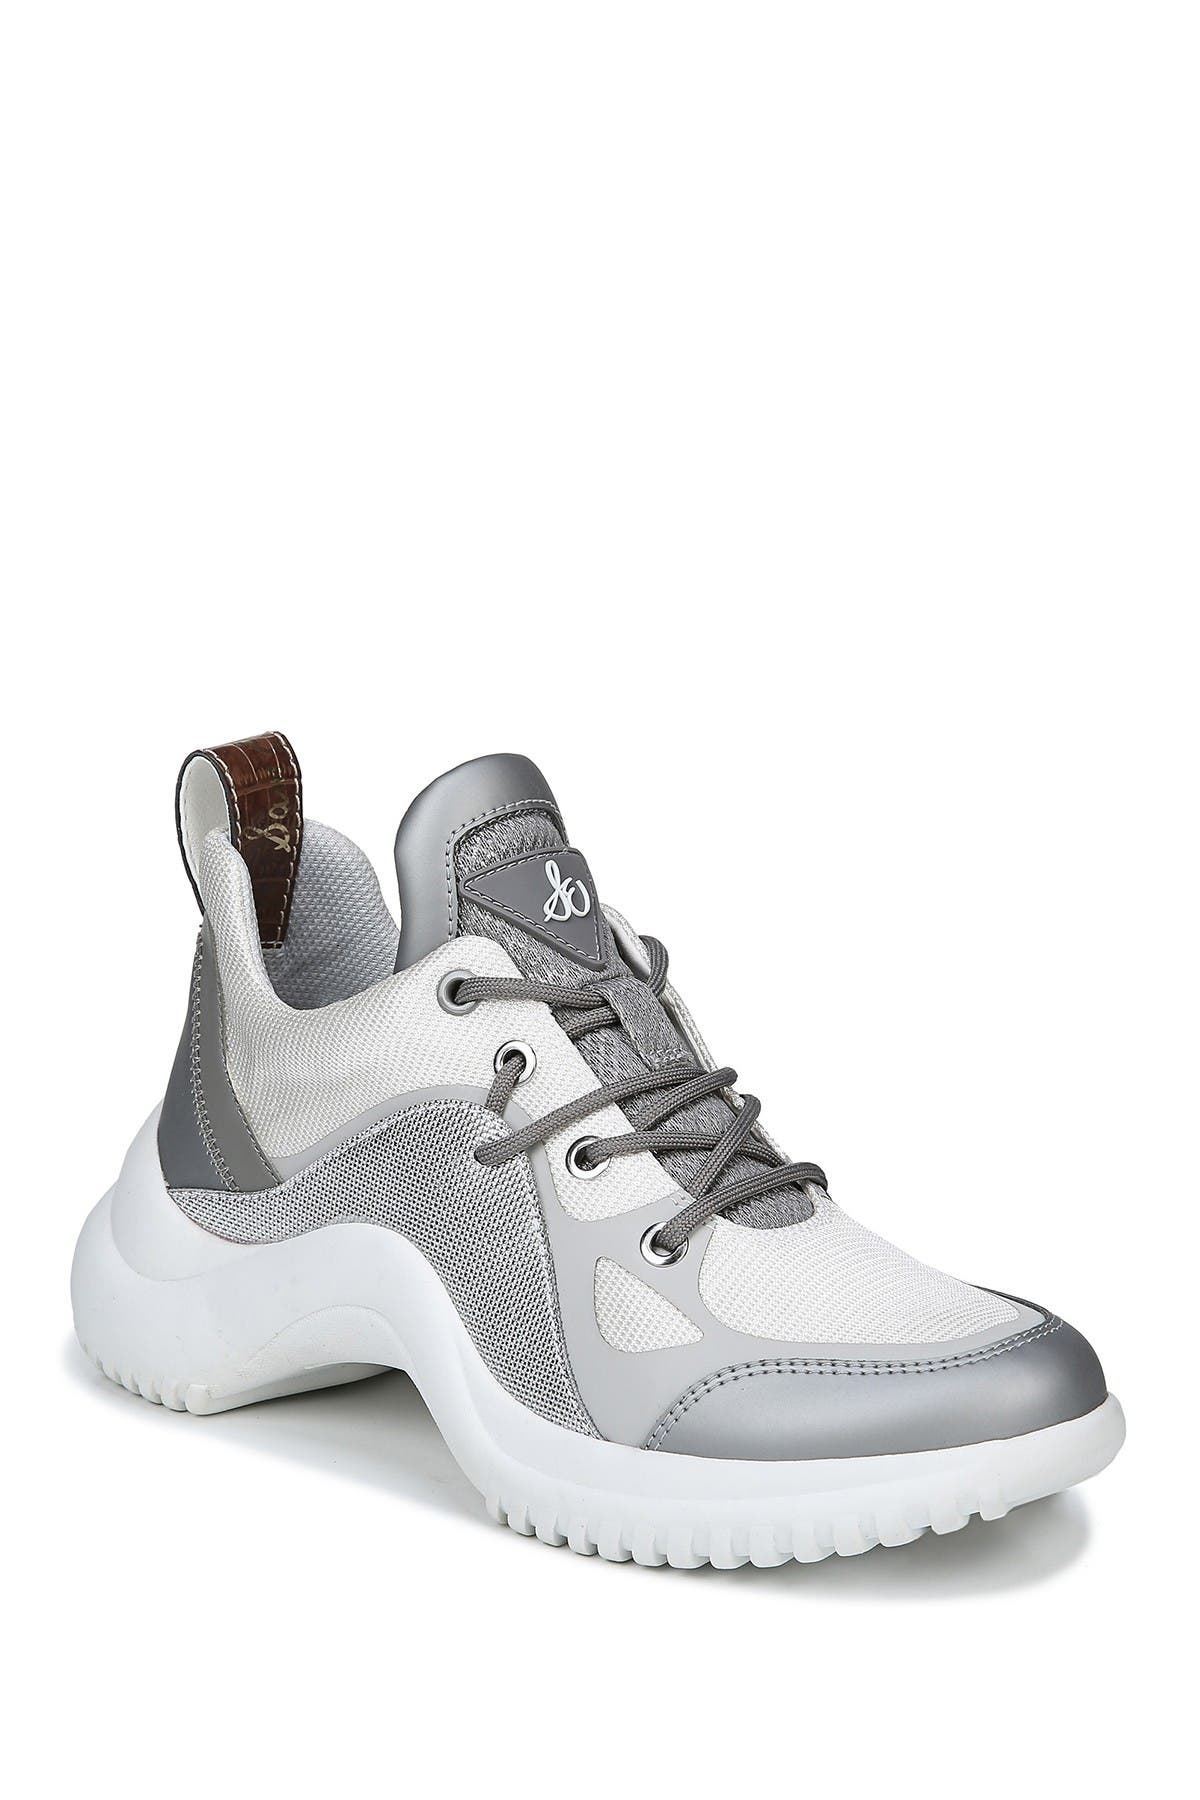 Sam Edelman   Meena Sneaker   Nordstrom